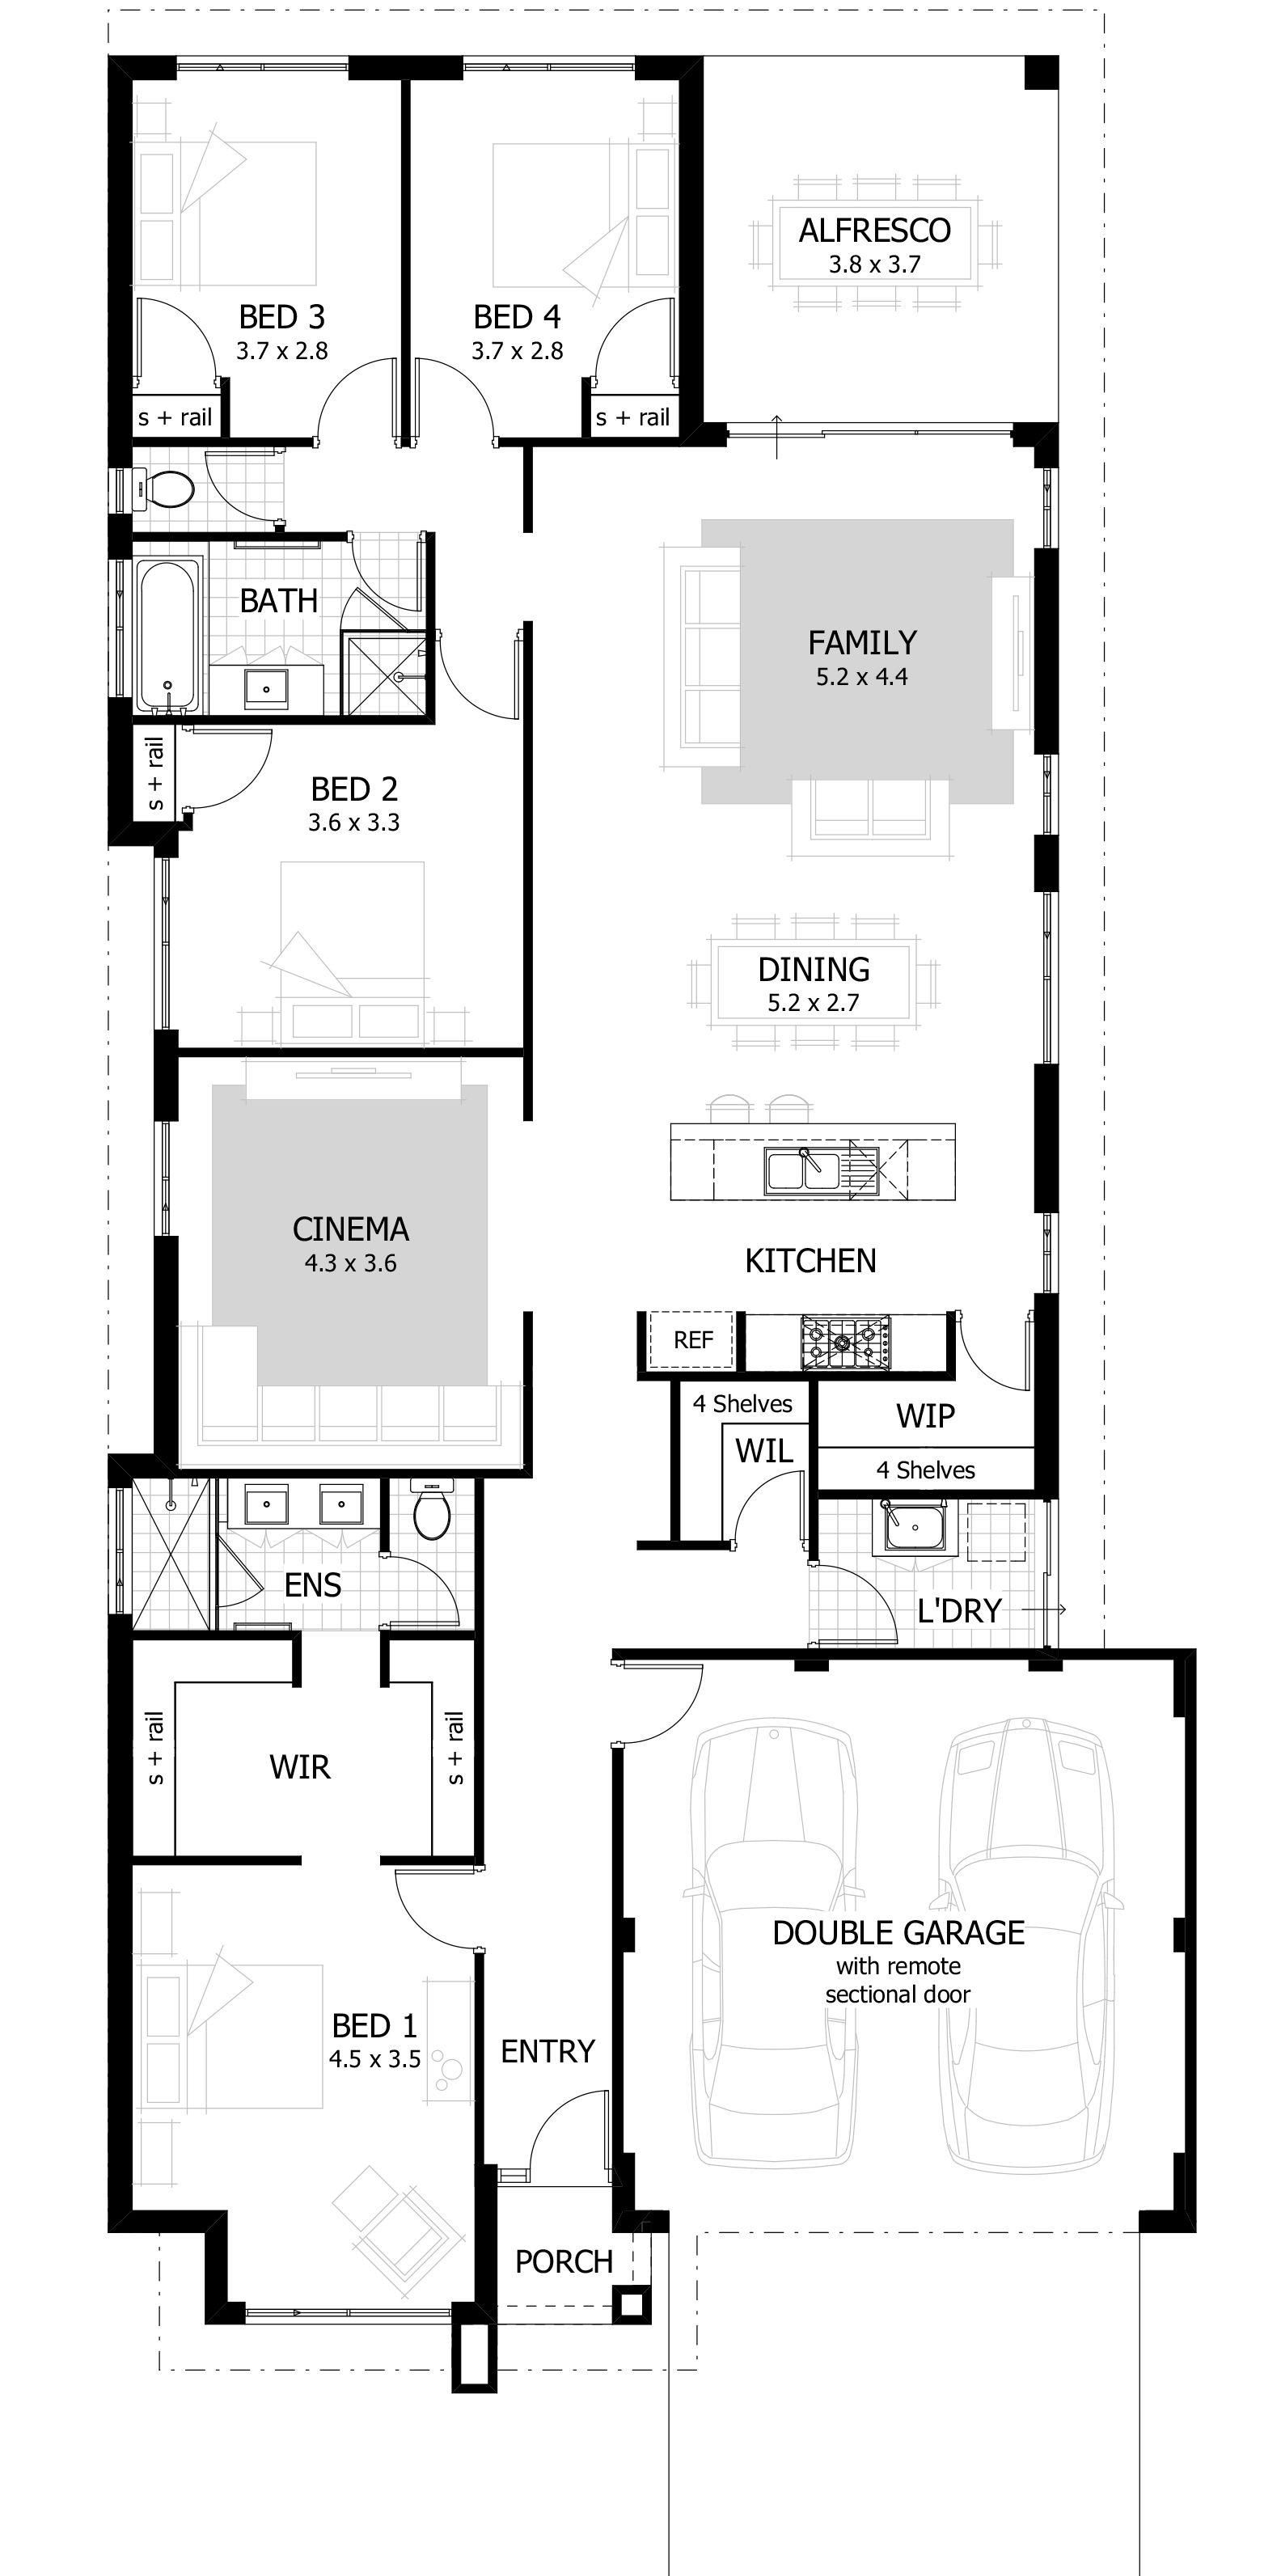 4 Bedroom House Plans Amp Home Designs